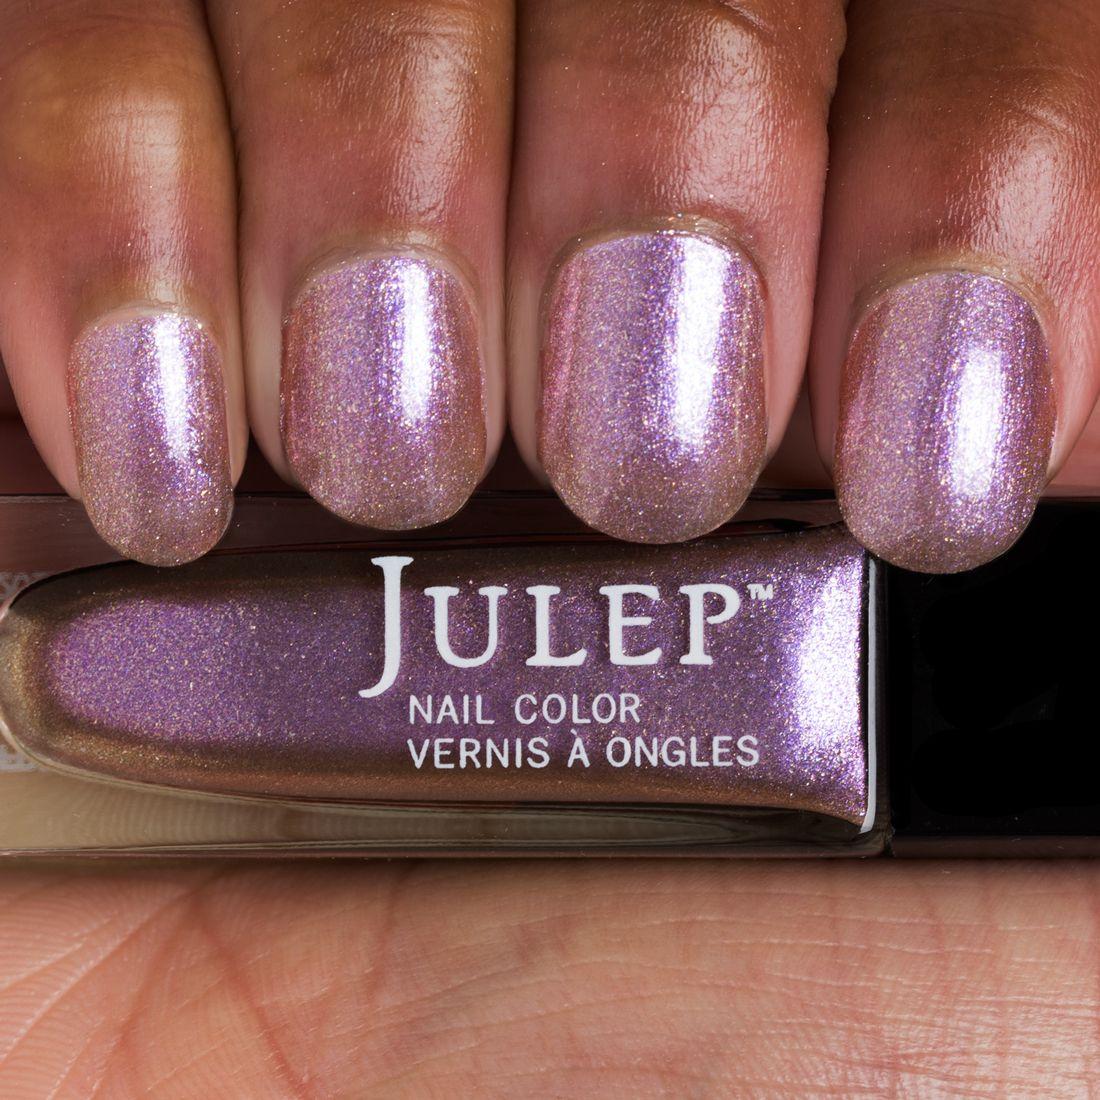 Phia- Alluring orchid iridescent chrome | nAiLs | Pinterest | Nail ...